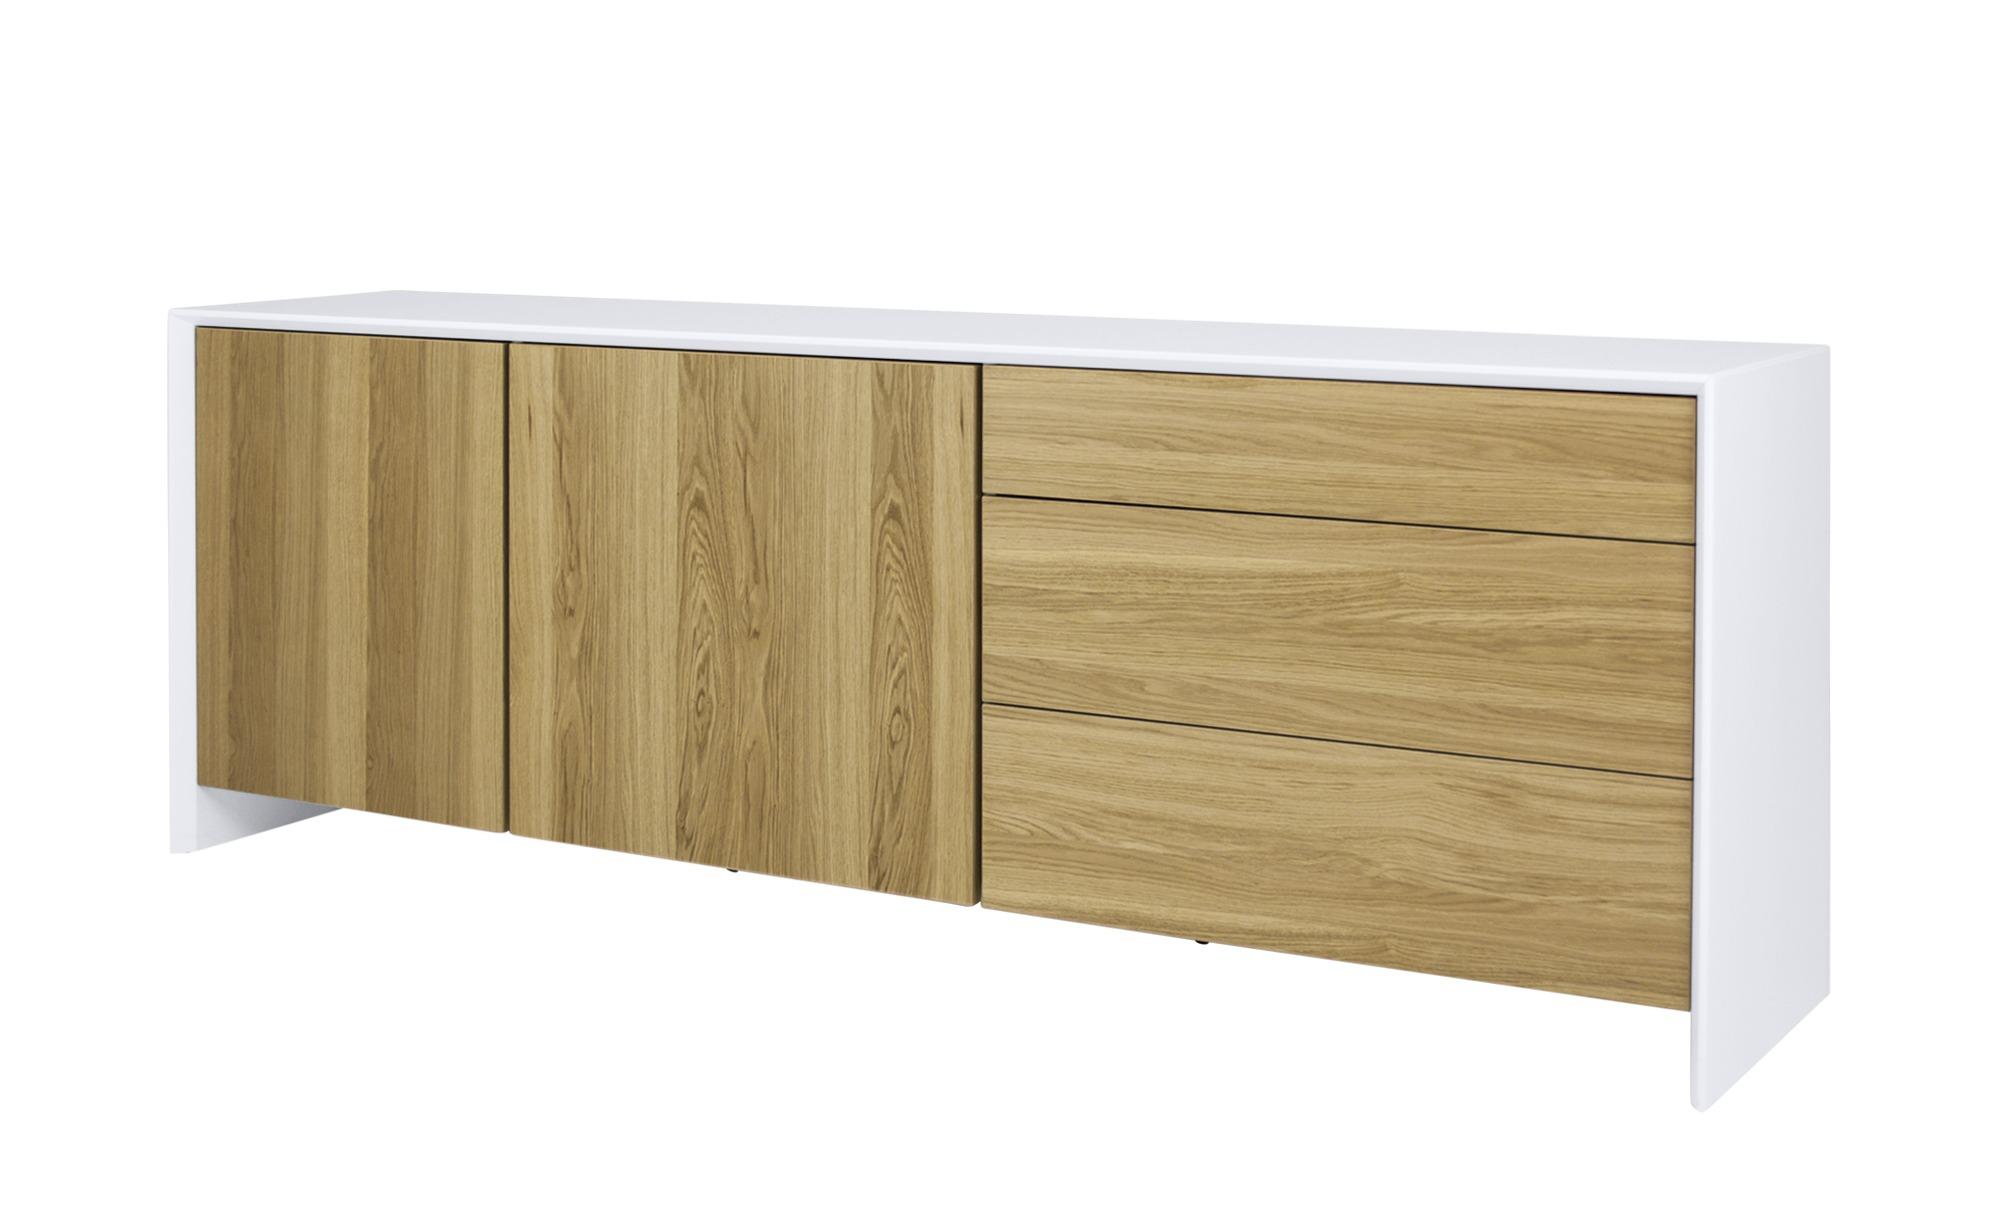 sideboard leif breite 220 cm h he 80 cm online kaufen bei woonio. Black Bedroom Furniture Sets. Home Design Ideas